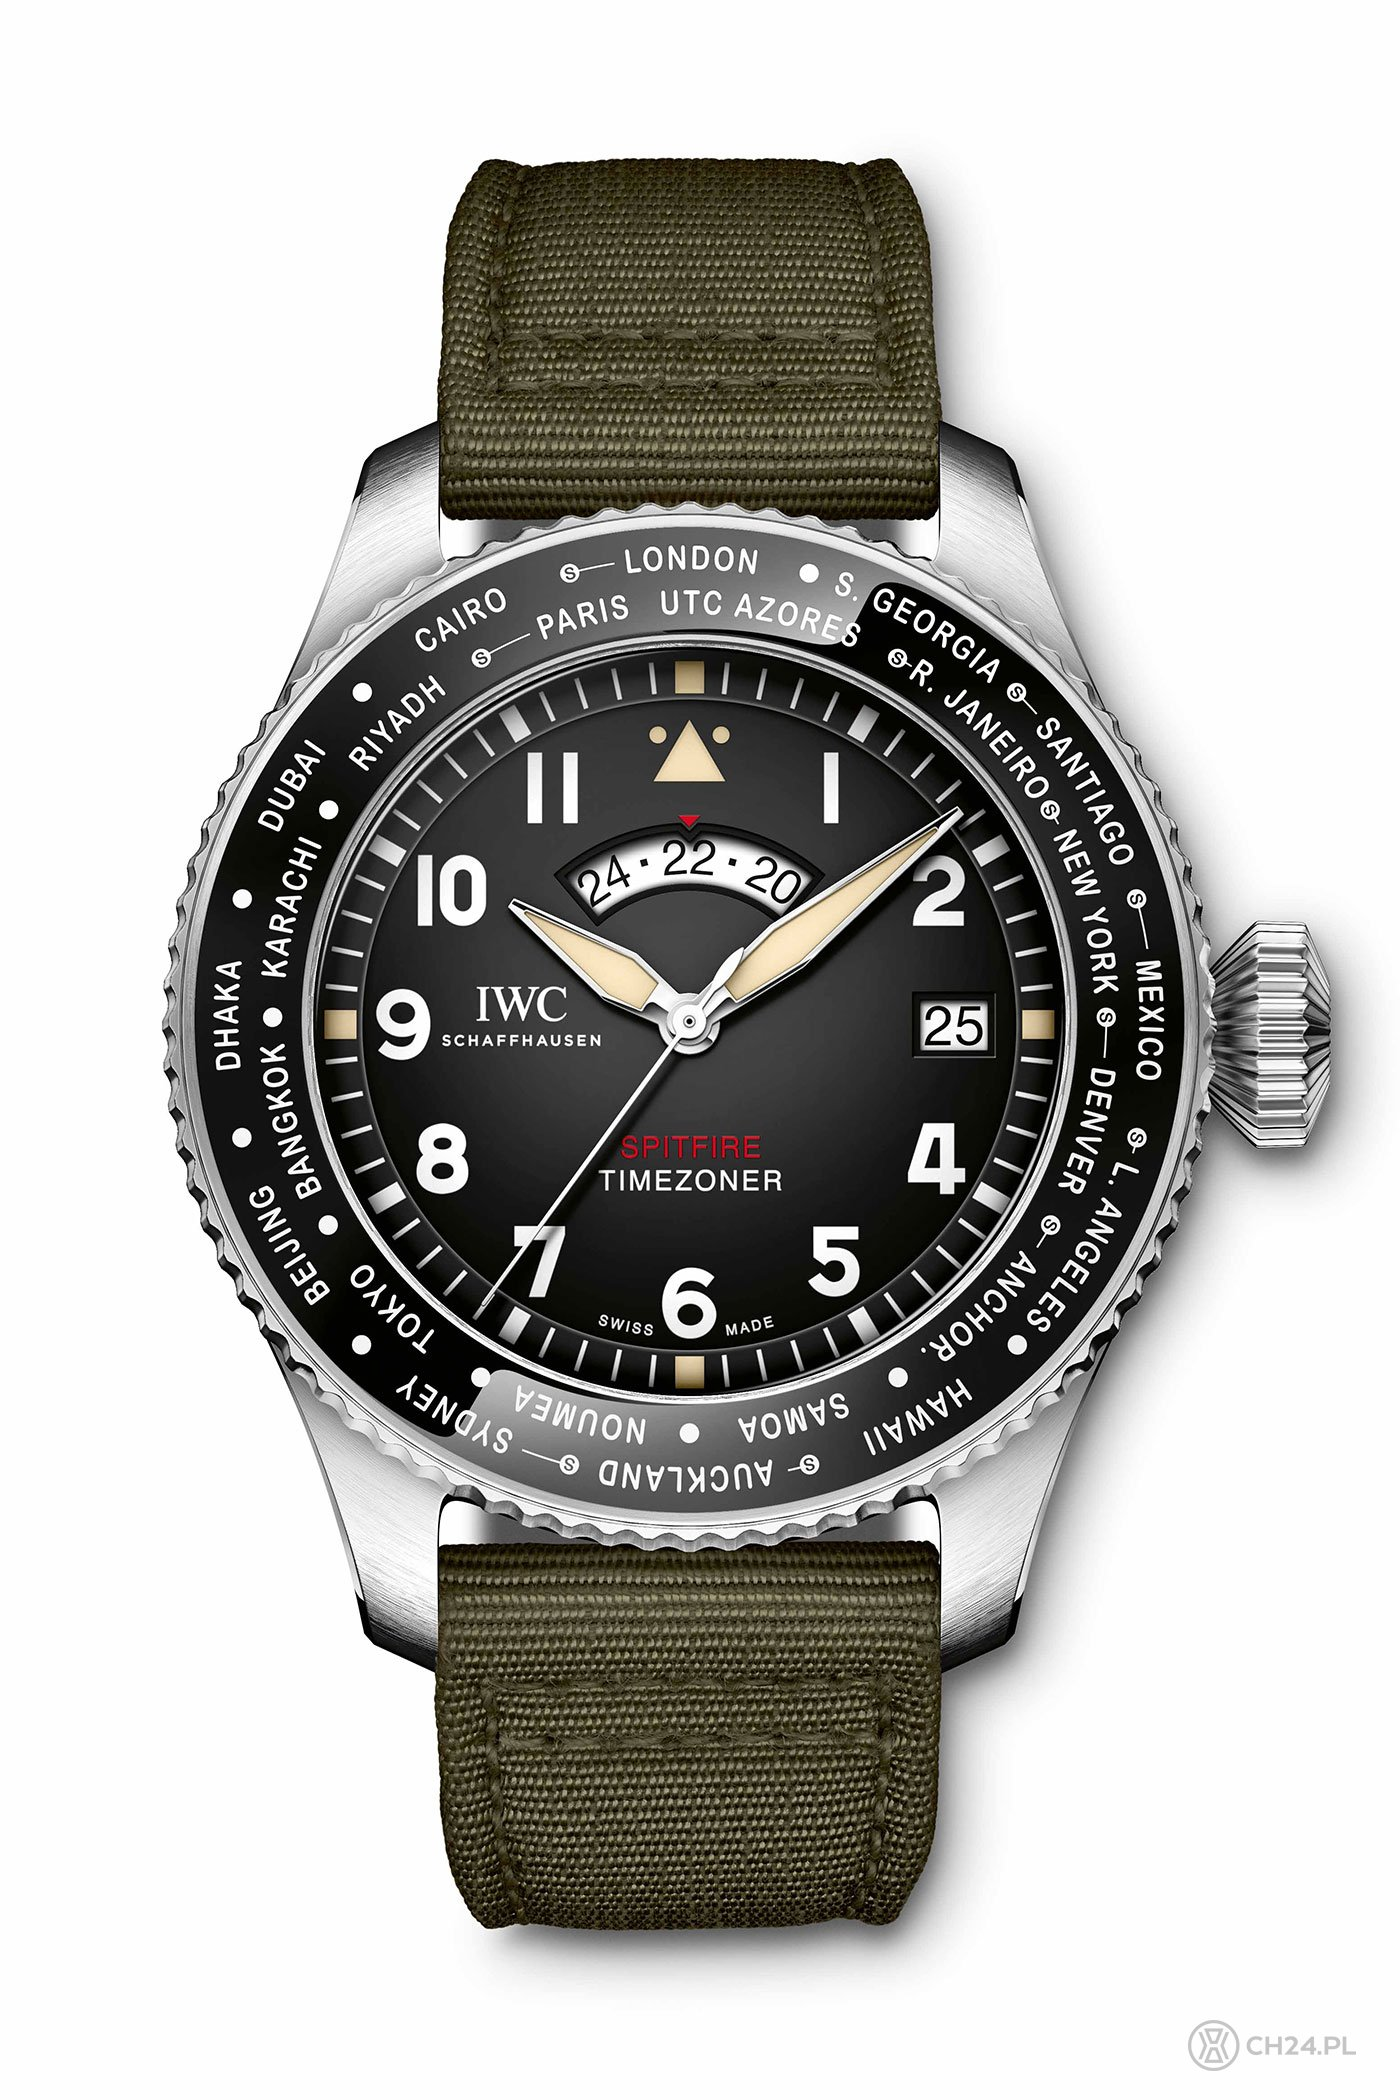 "IWC Pilot's Watch Timezoner Spitfire Edition ""The Longest Flight"""